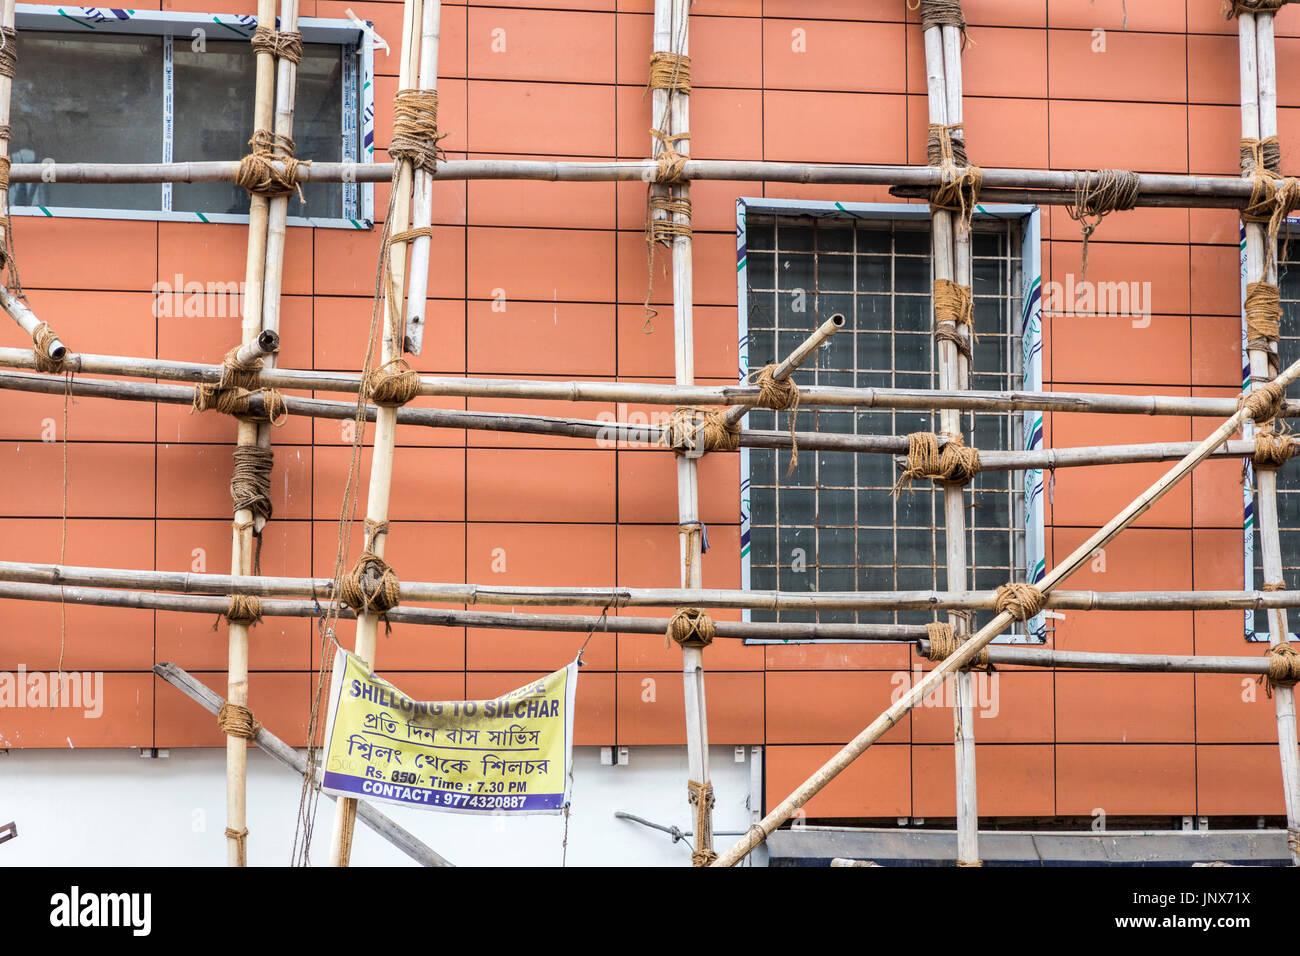 Bamboo scaffolding on building, Shillong, Meghalaya, India - Stock Image